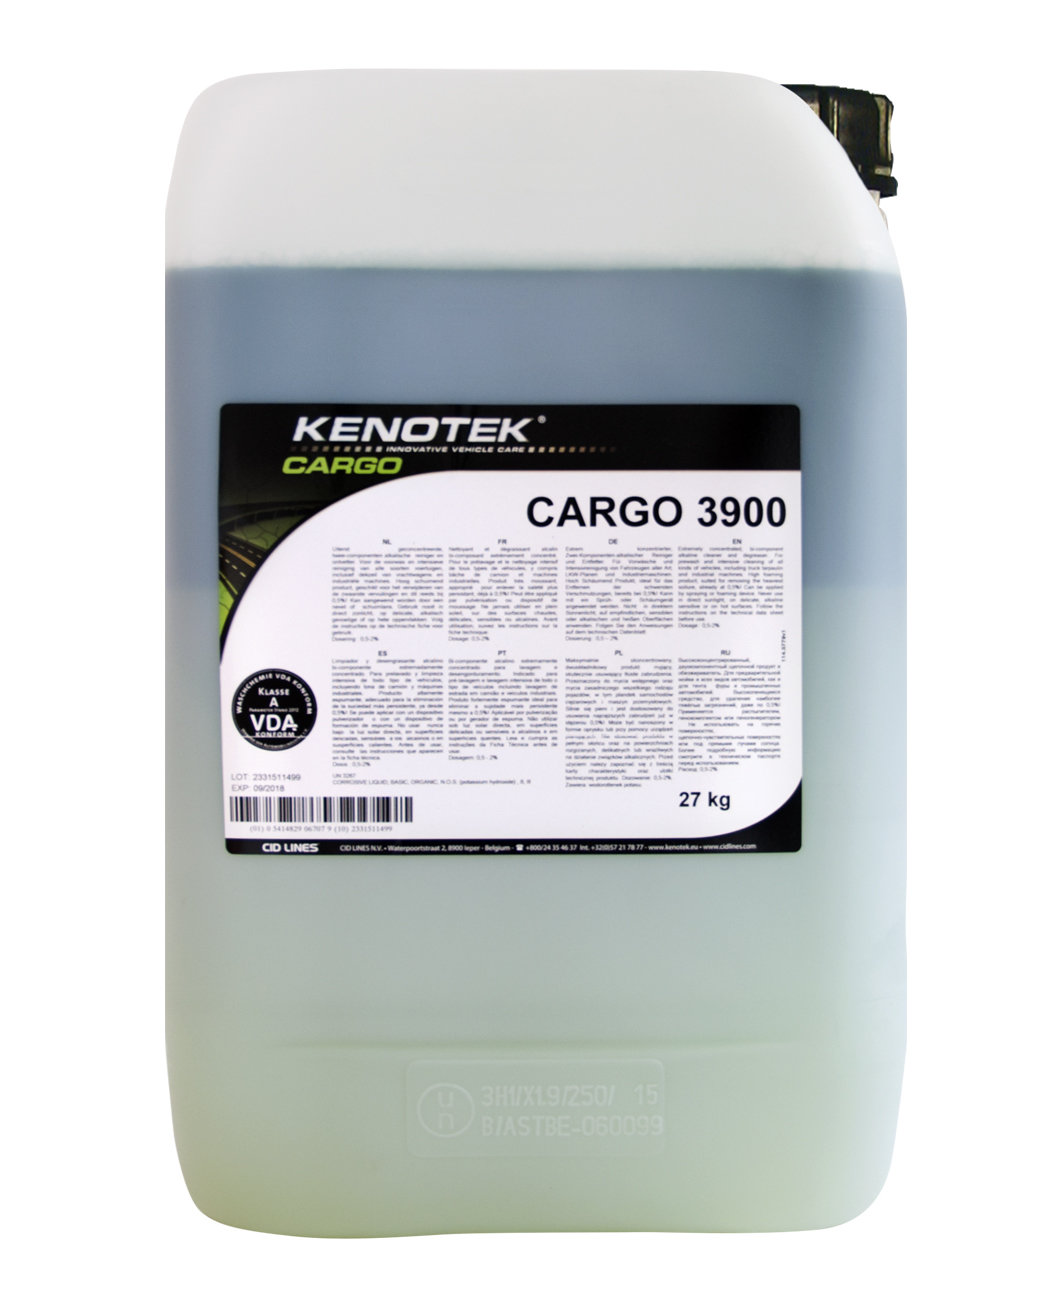 Kenotek CARGO 3900, inhoud: 27 kg